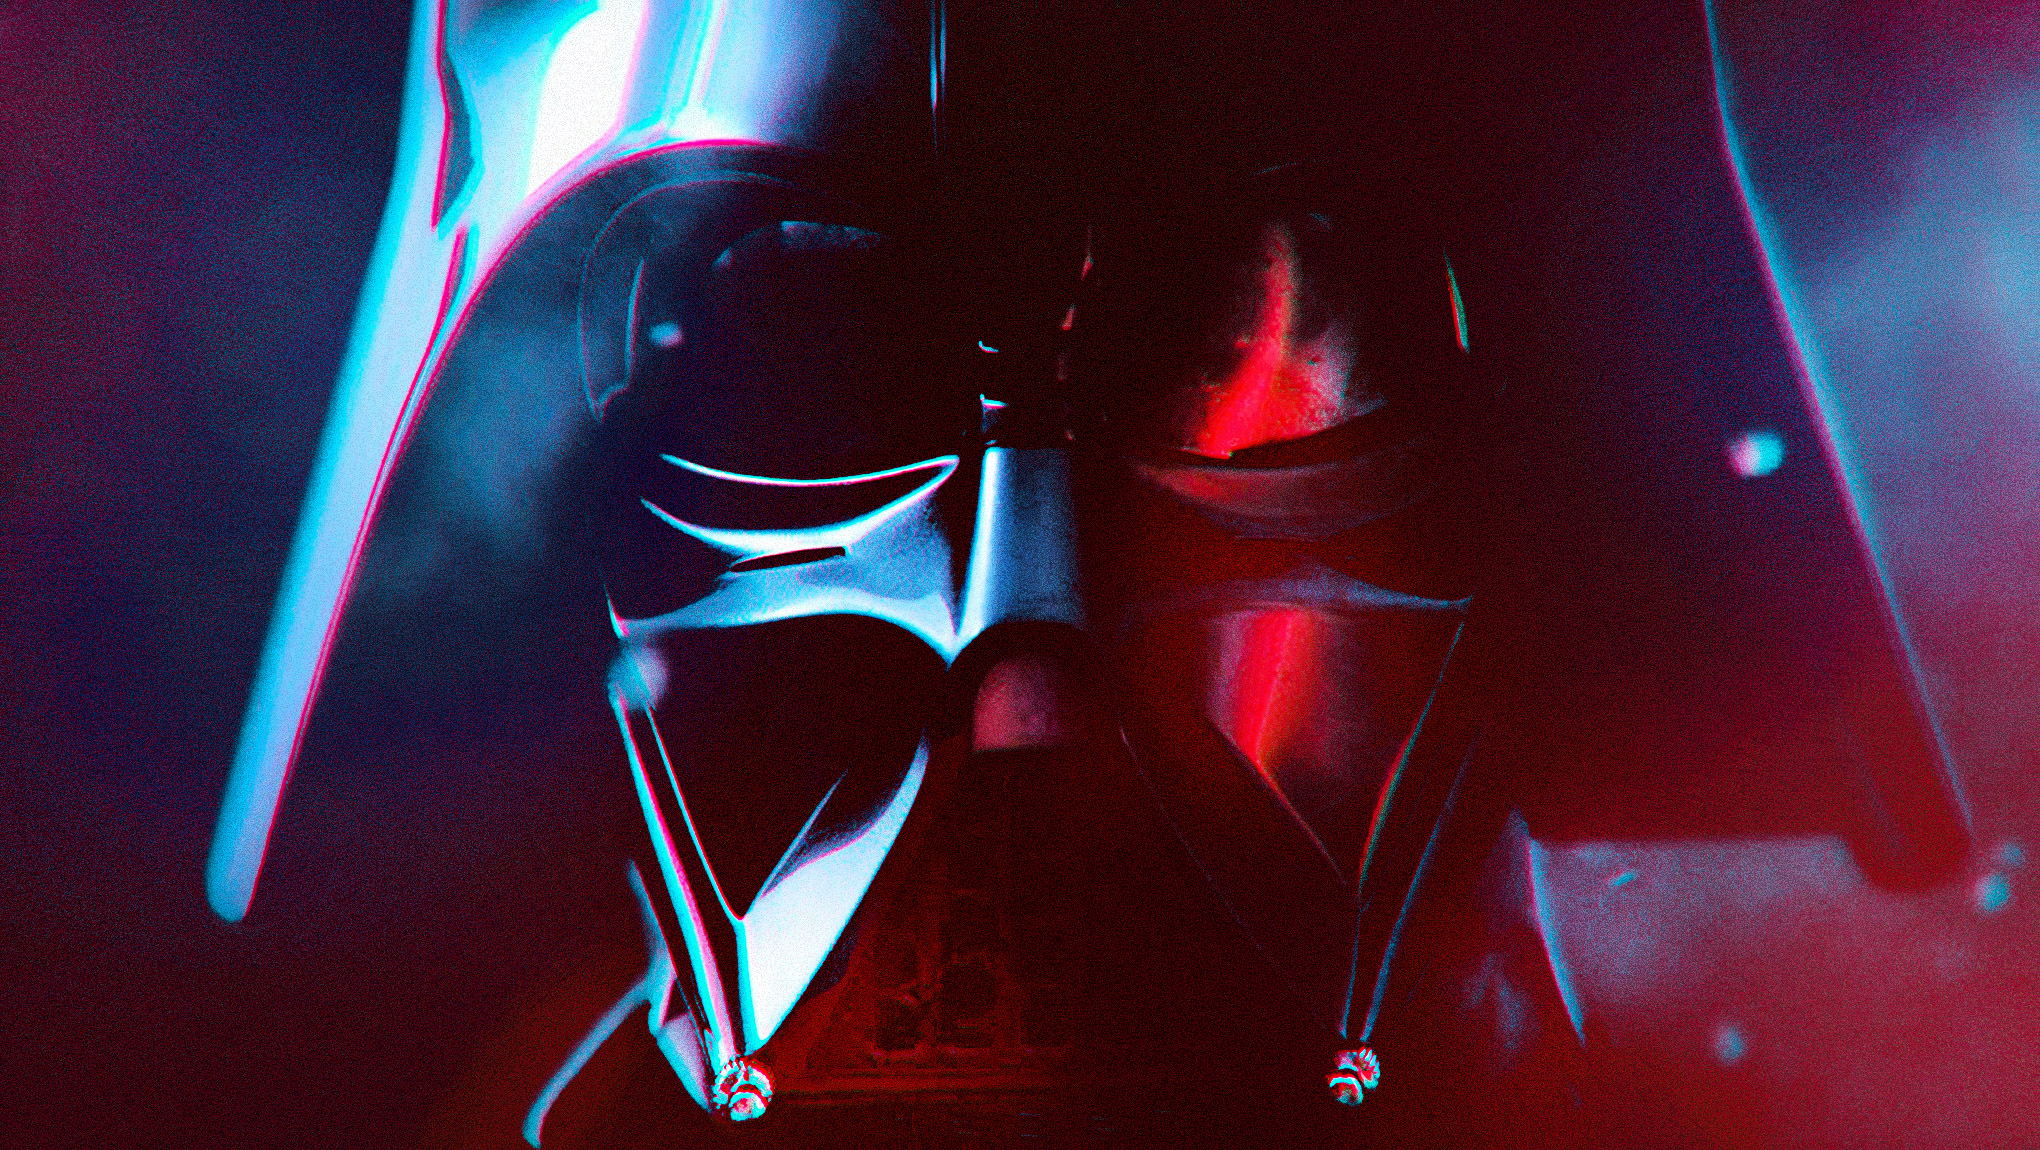 photo illustration of Darth Vader in close-up